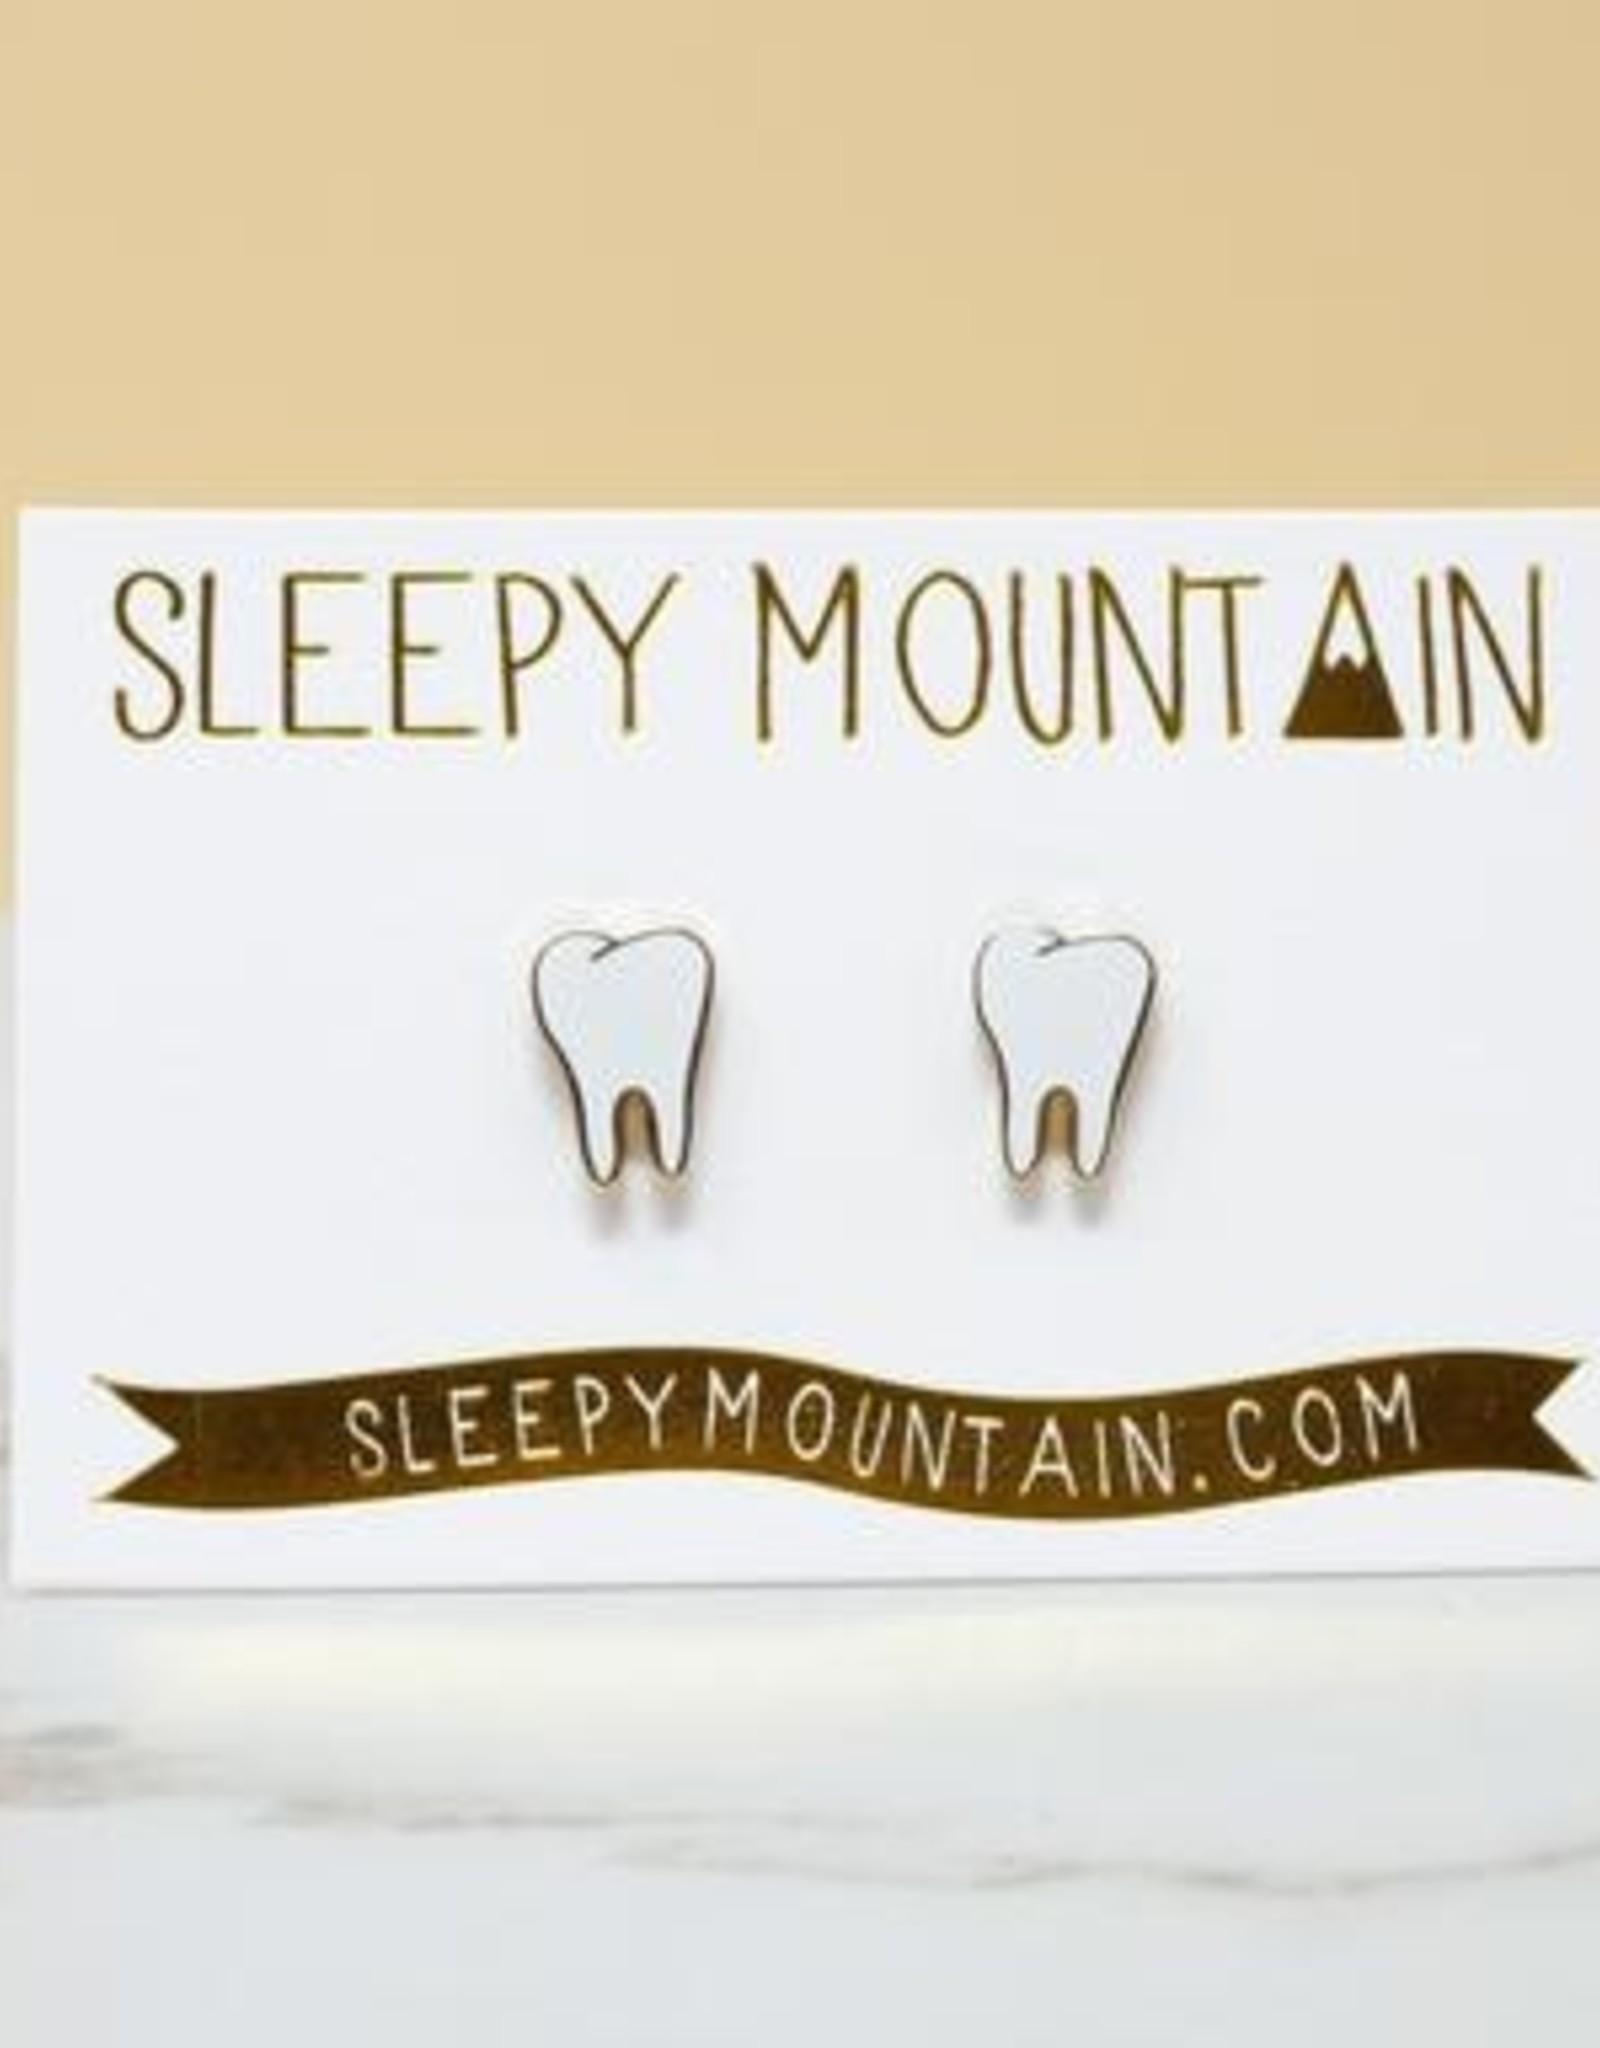 Sleepy Mountain Teeth Earrings // 22K Gold Plated